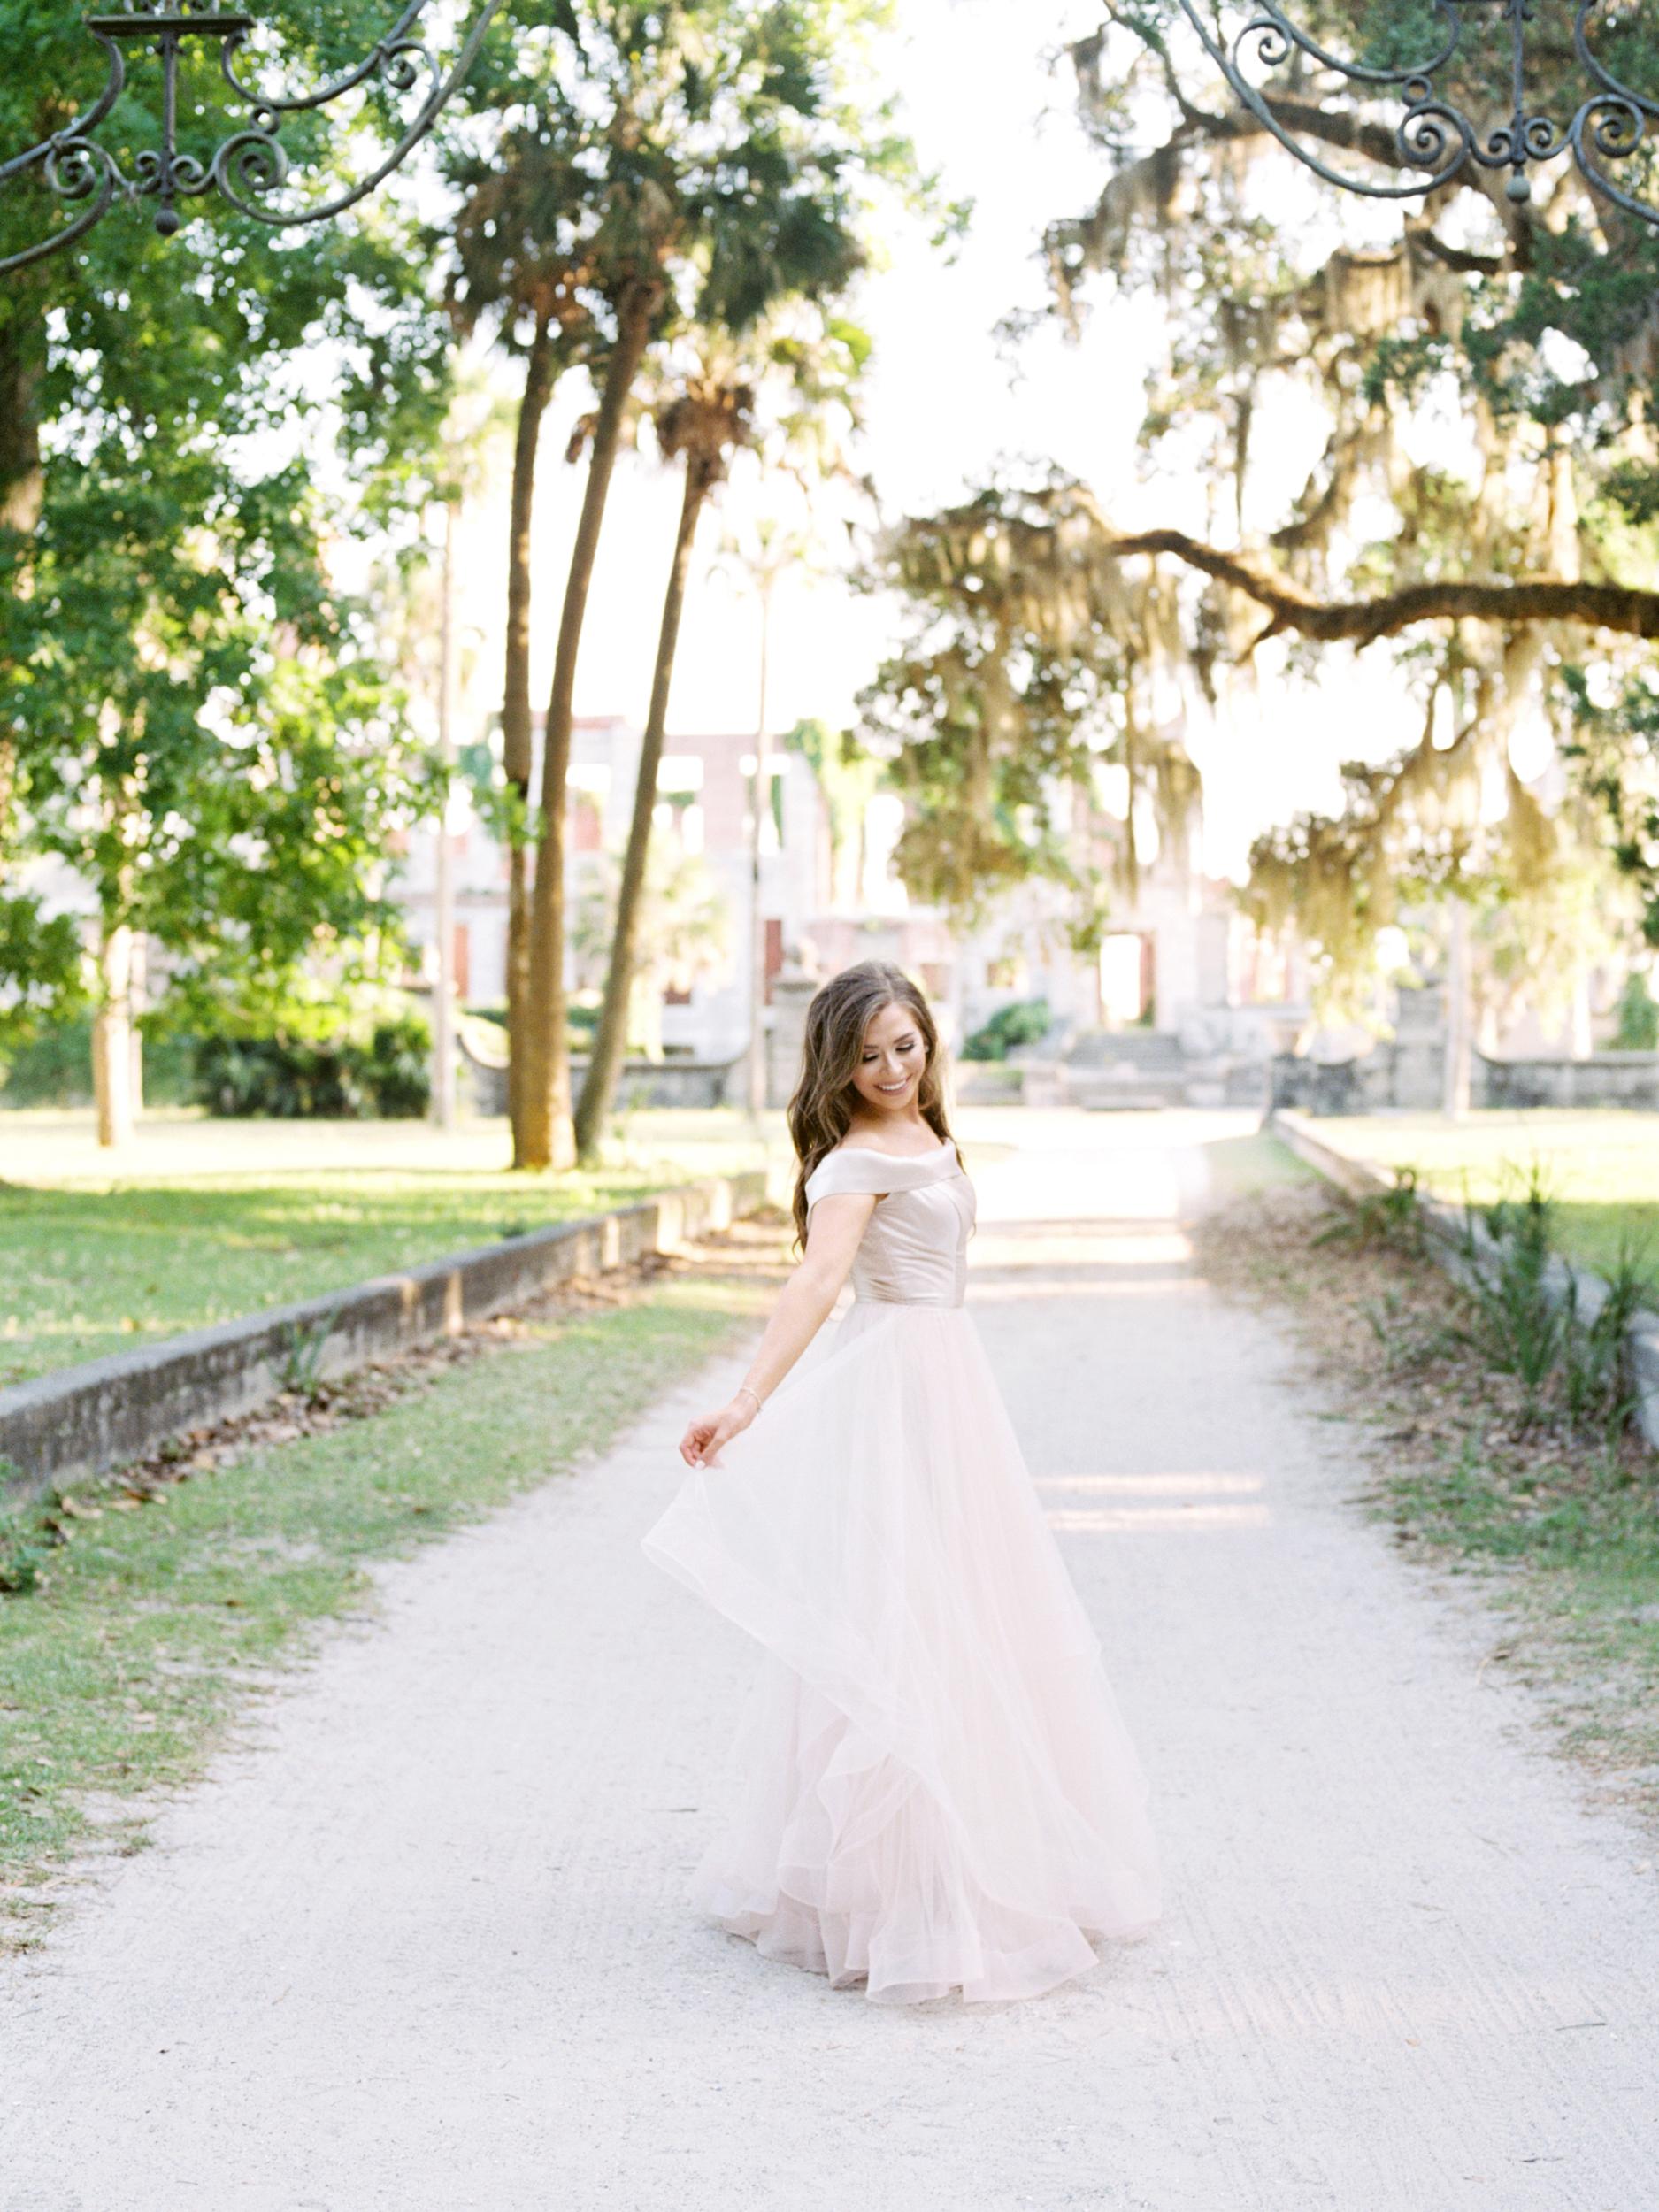 Lisa Silva Photography Jacksonville, St Augustine, Ponte Vedra Beach, Fernandina Beach, Amelia Island, Florida Fine Art Film Wedding Photographer7.jpg